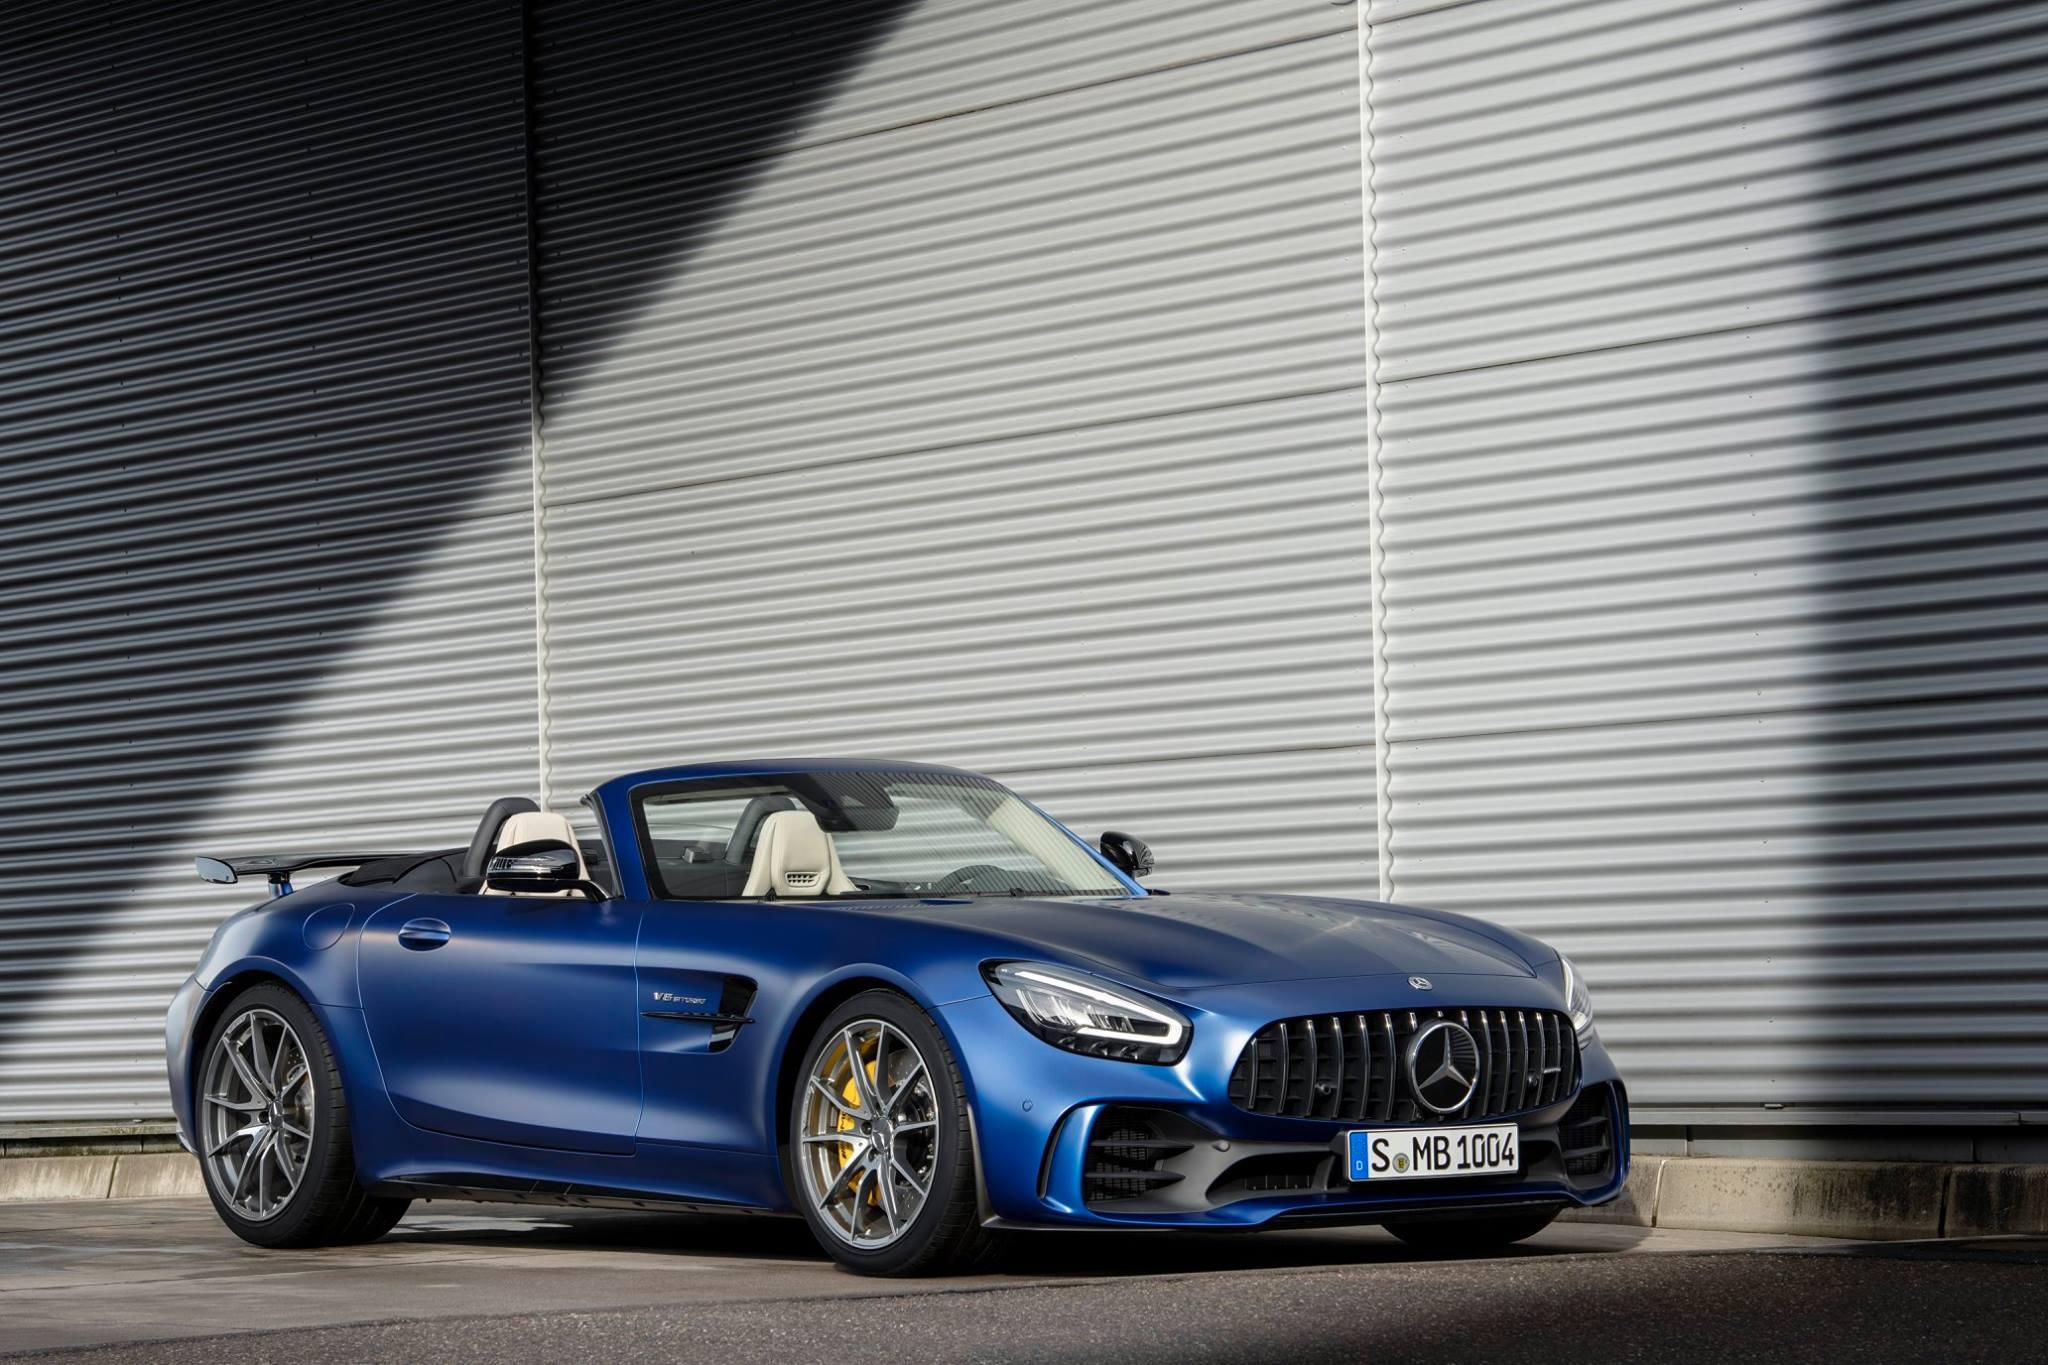 Mercedes-AMG-GTR-Roadster_acsptours4